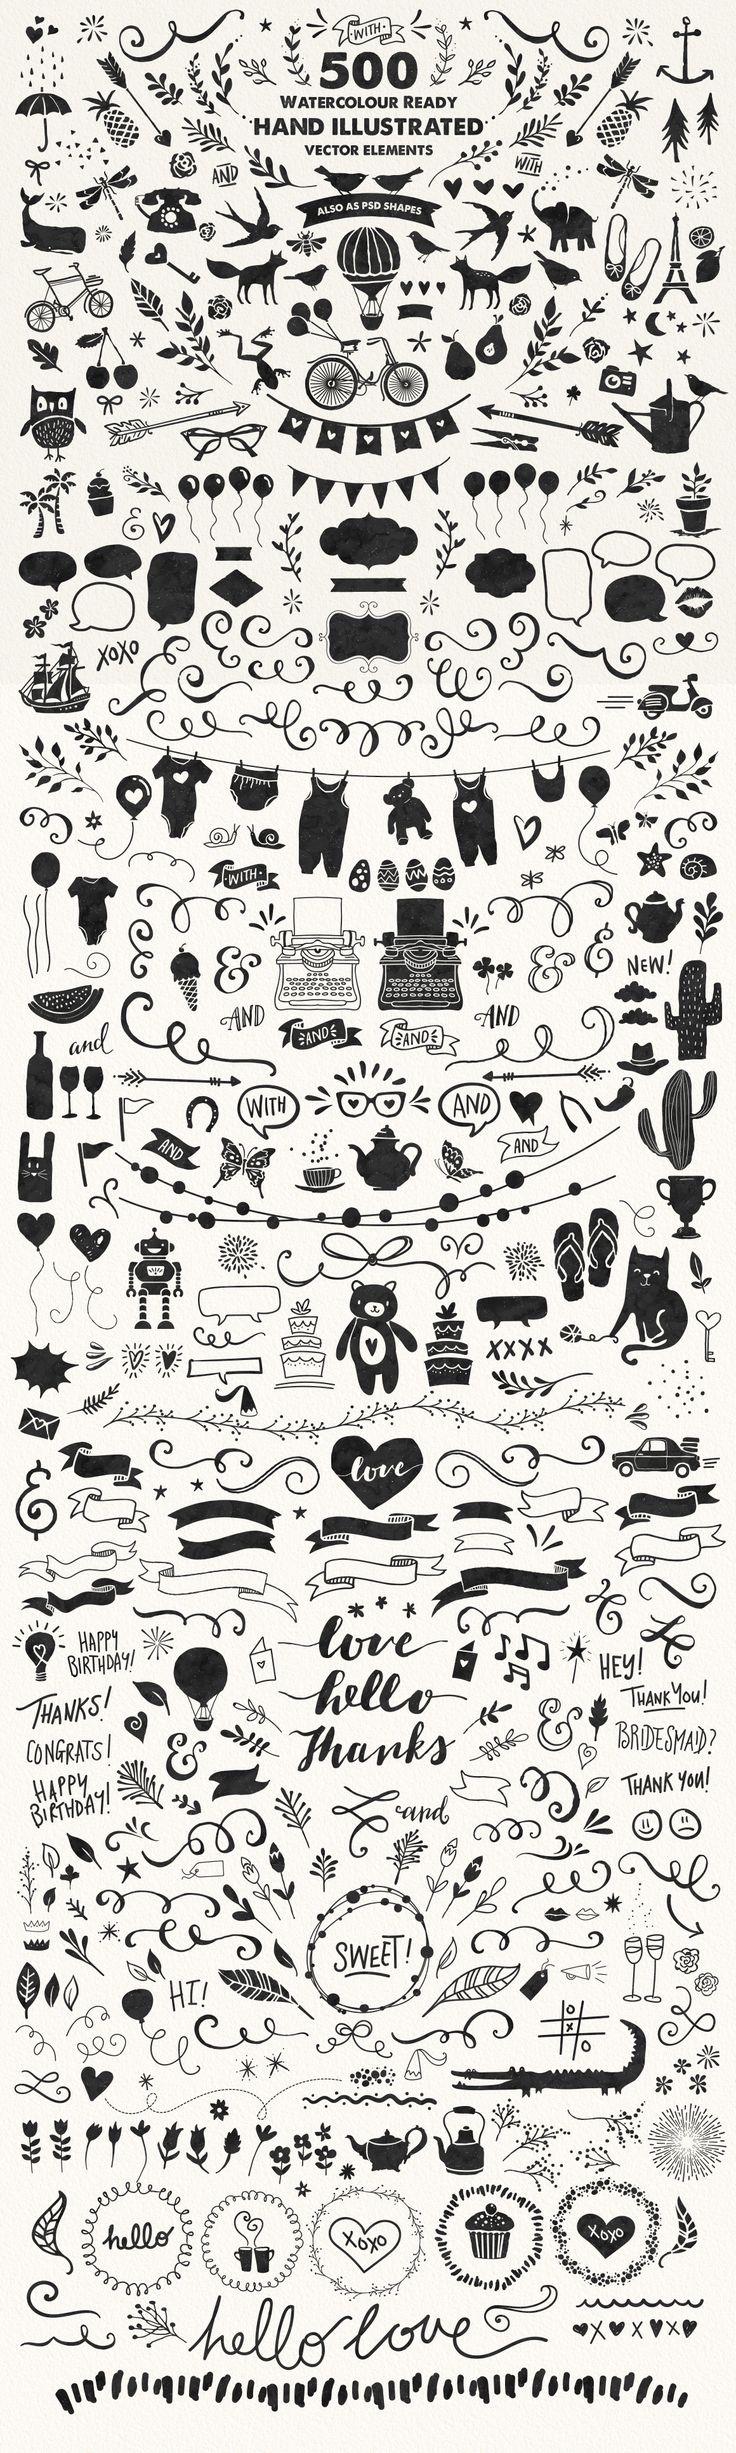 The Mammoth! Watercolour Kit by Nicky Laatz on Creative Market